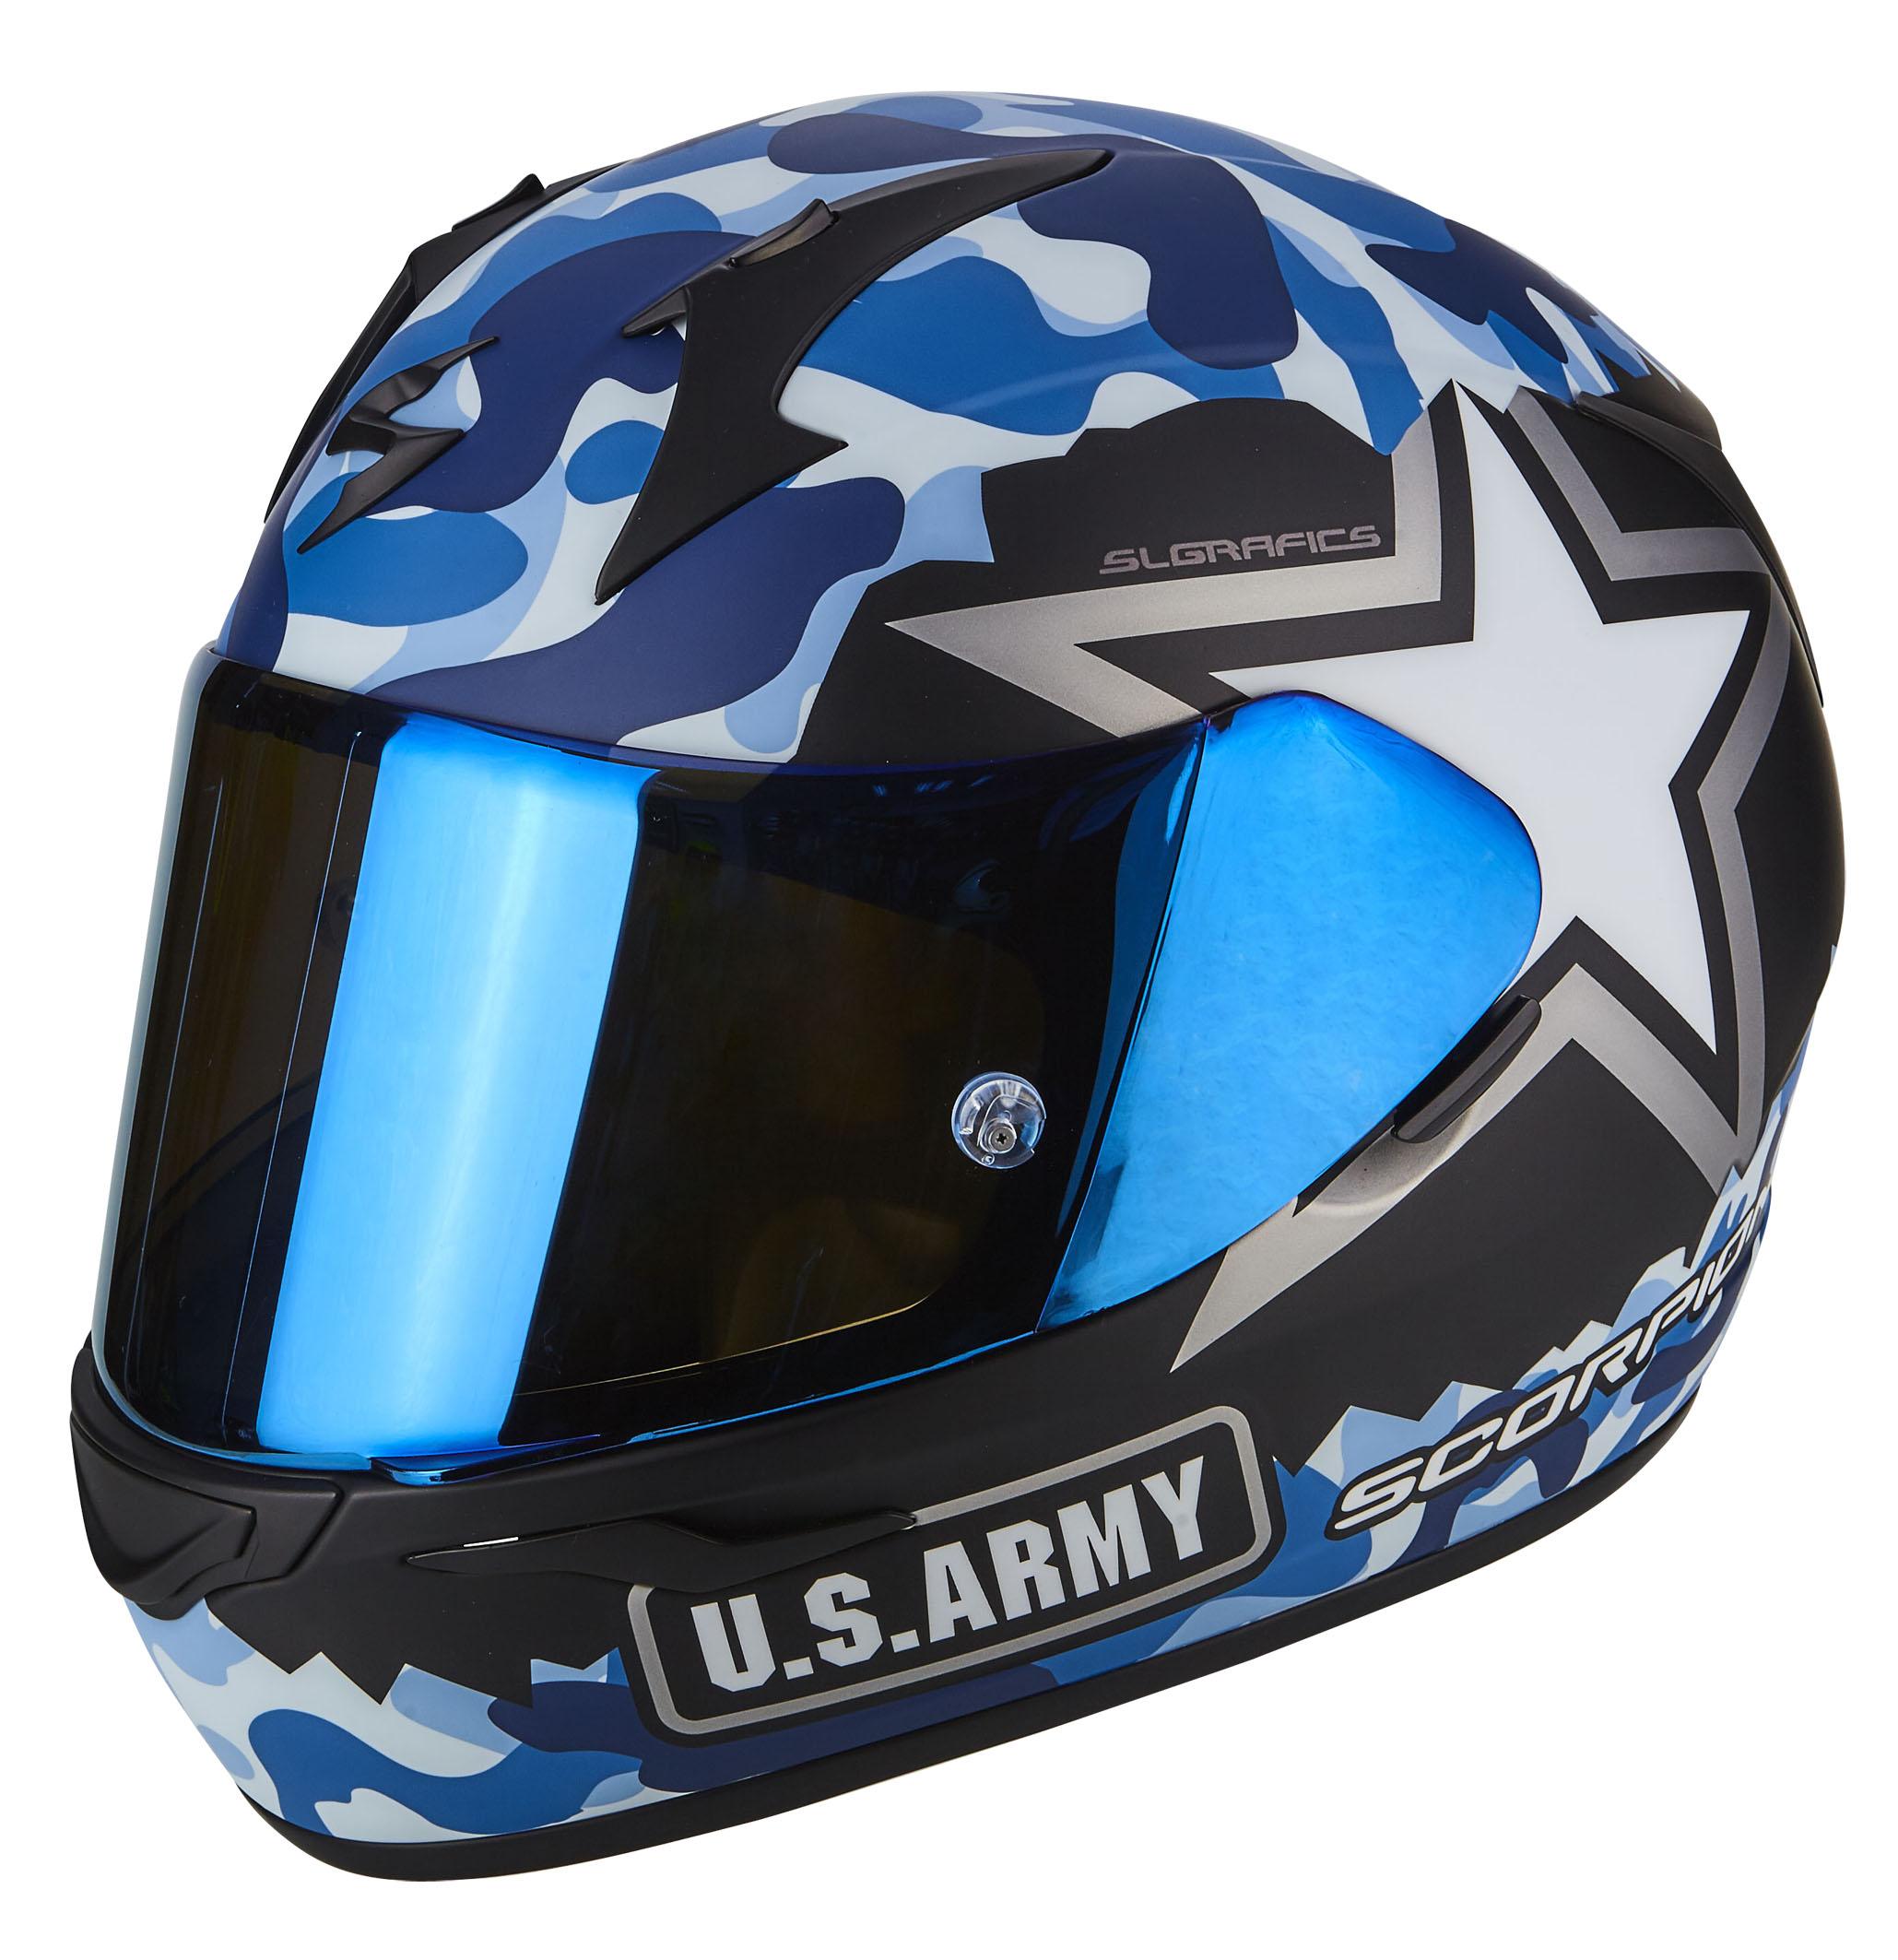 EXO-390 ARMY Matt Blue-Silver